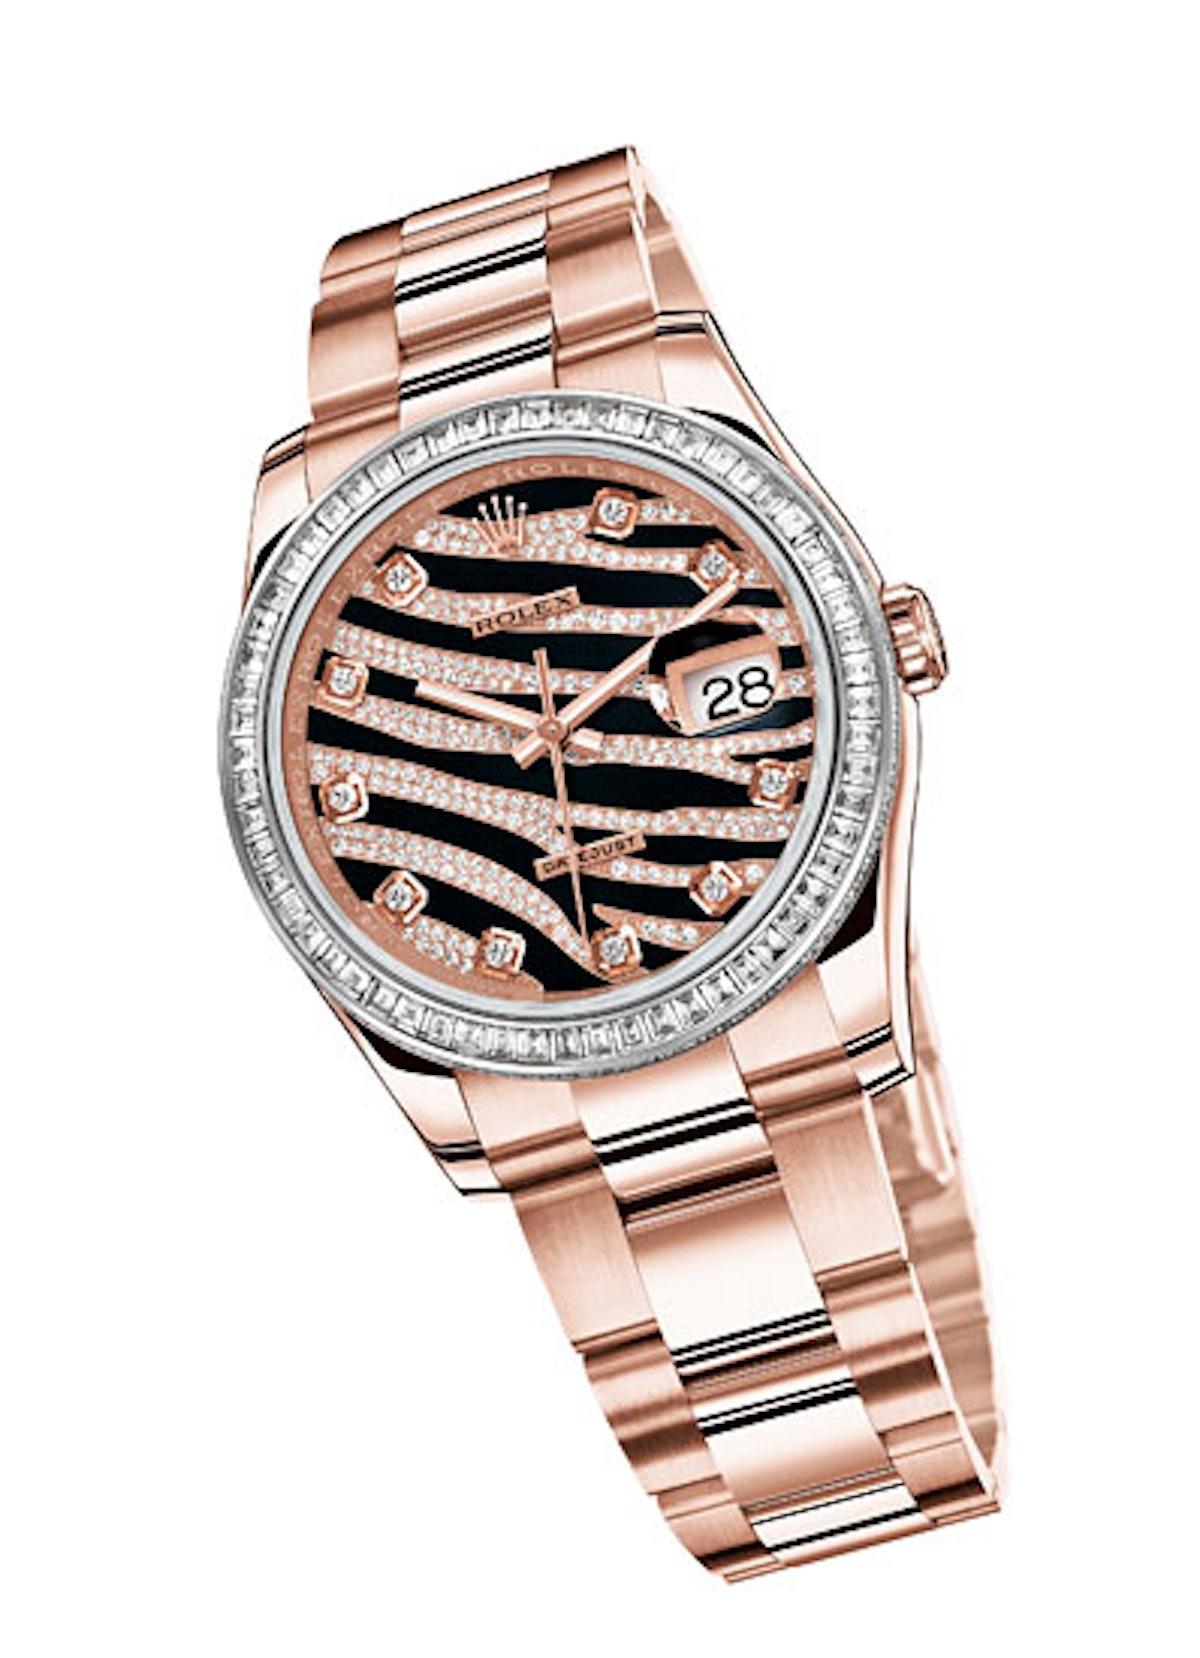 acss-basel-watches-roundup-05-v.jpg